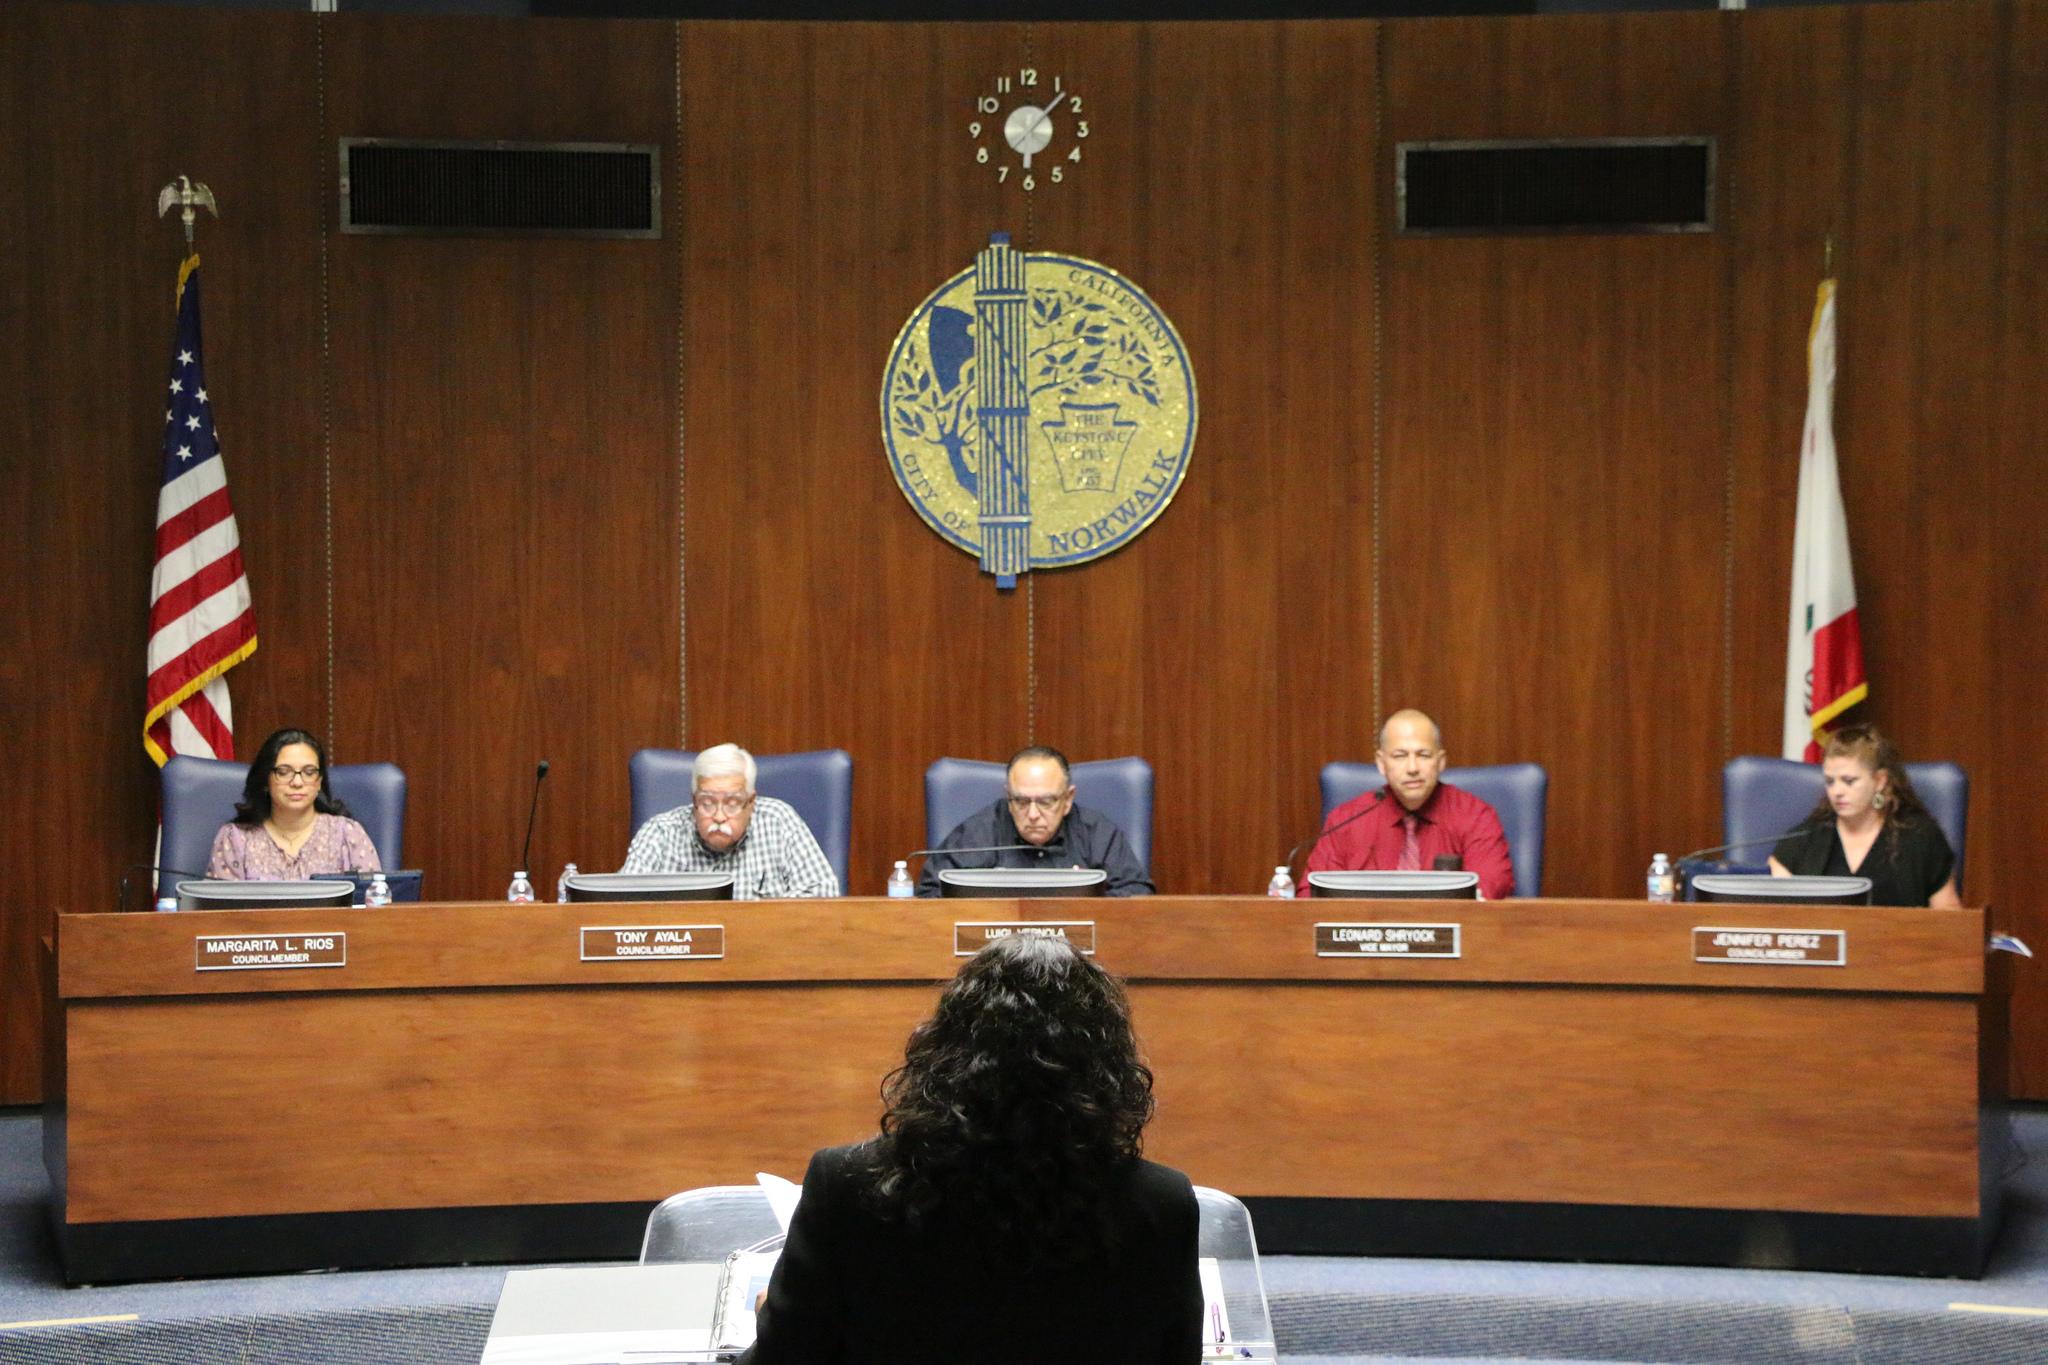 Norwalk city council members. City of Norwalk photo